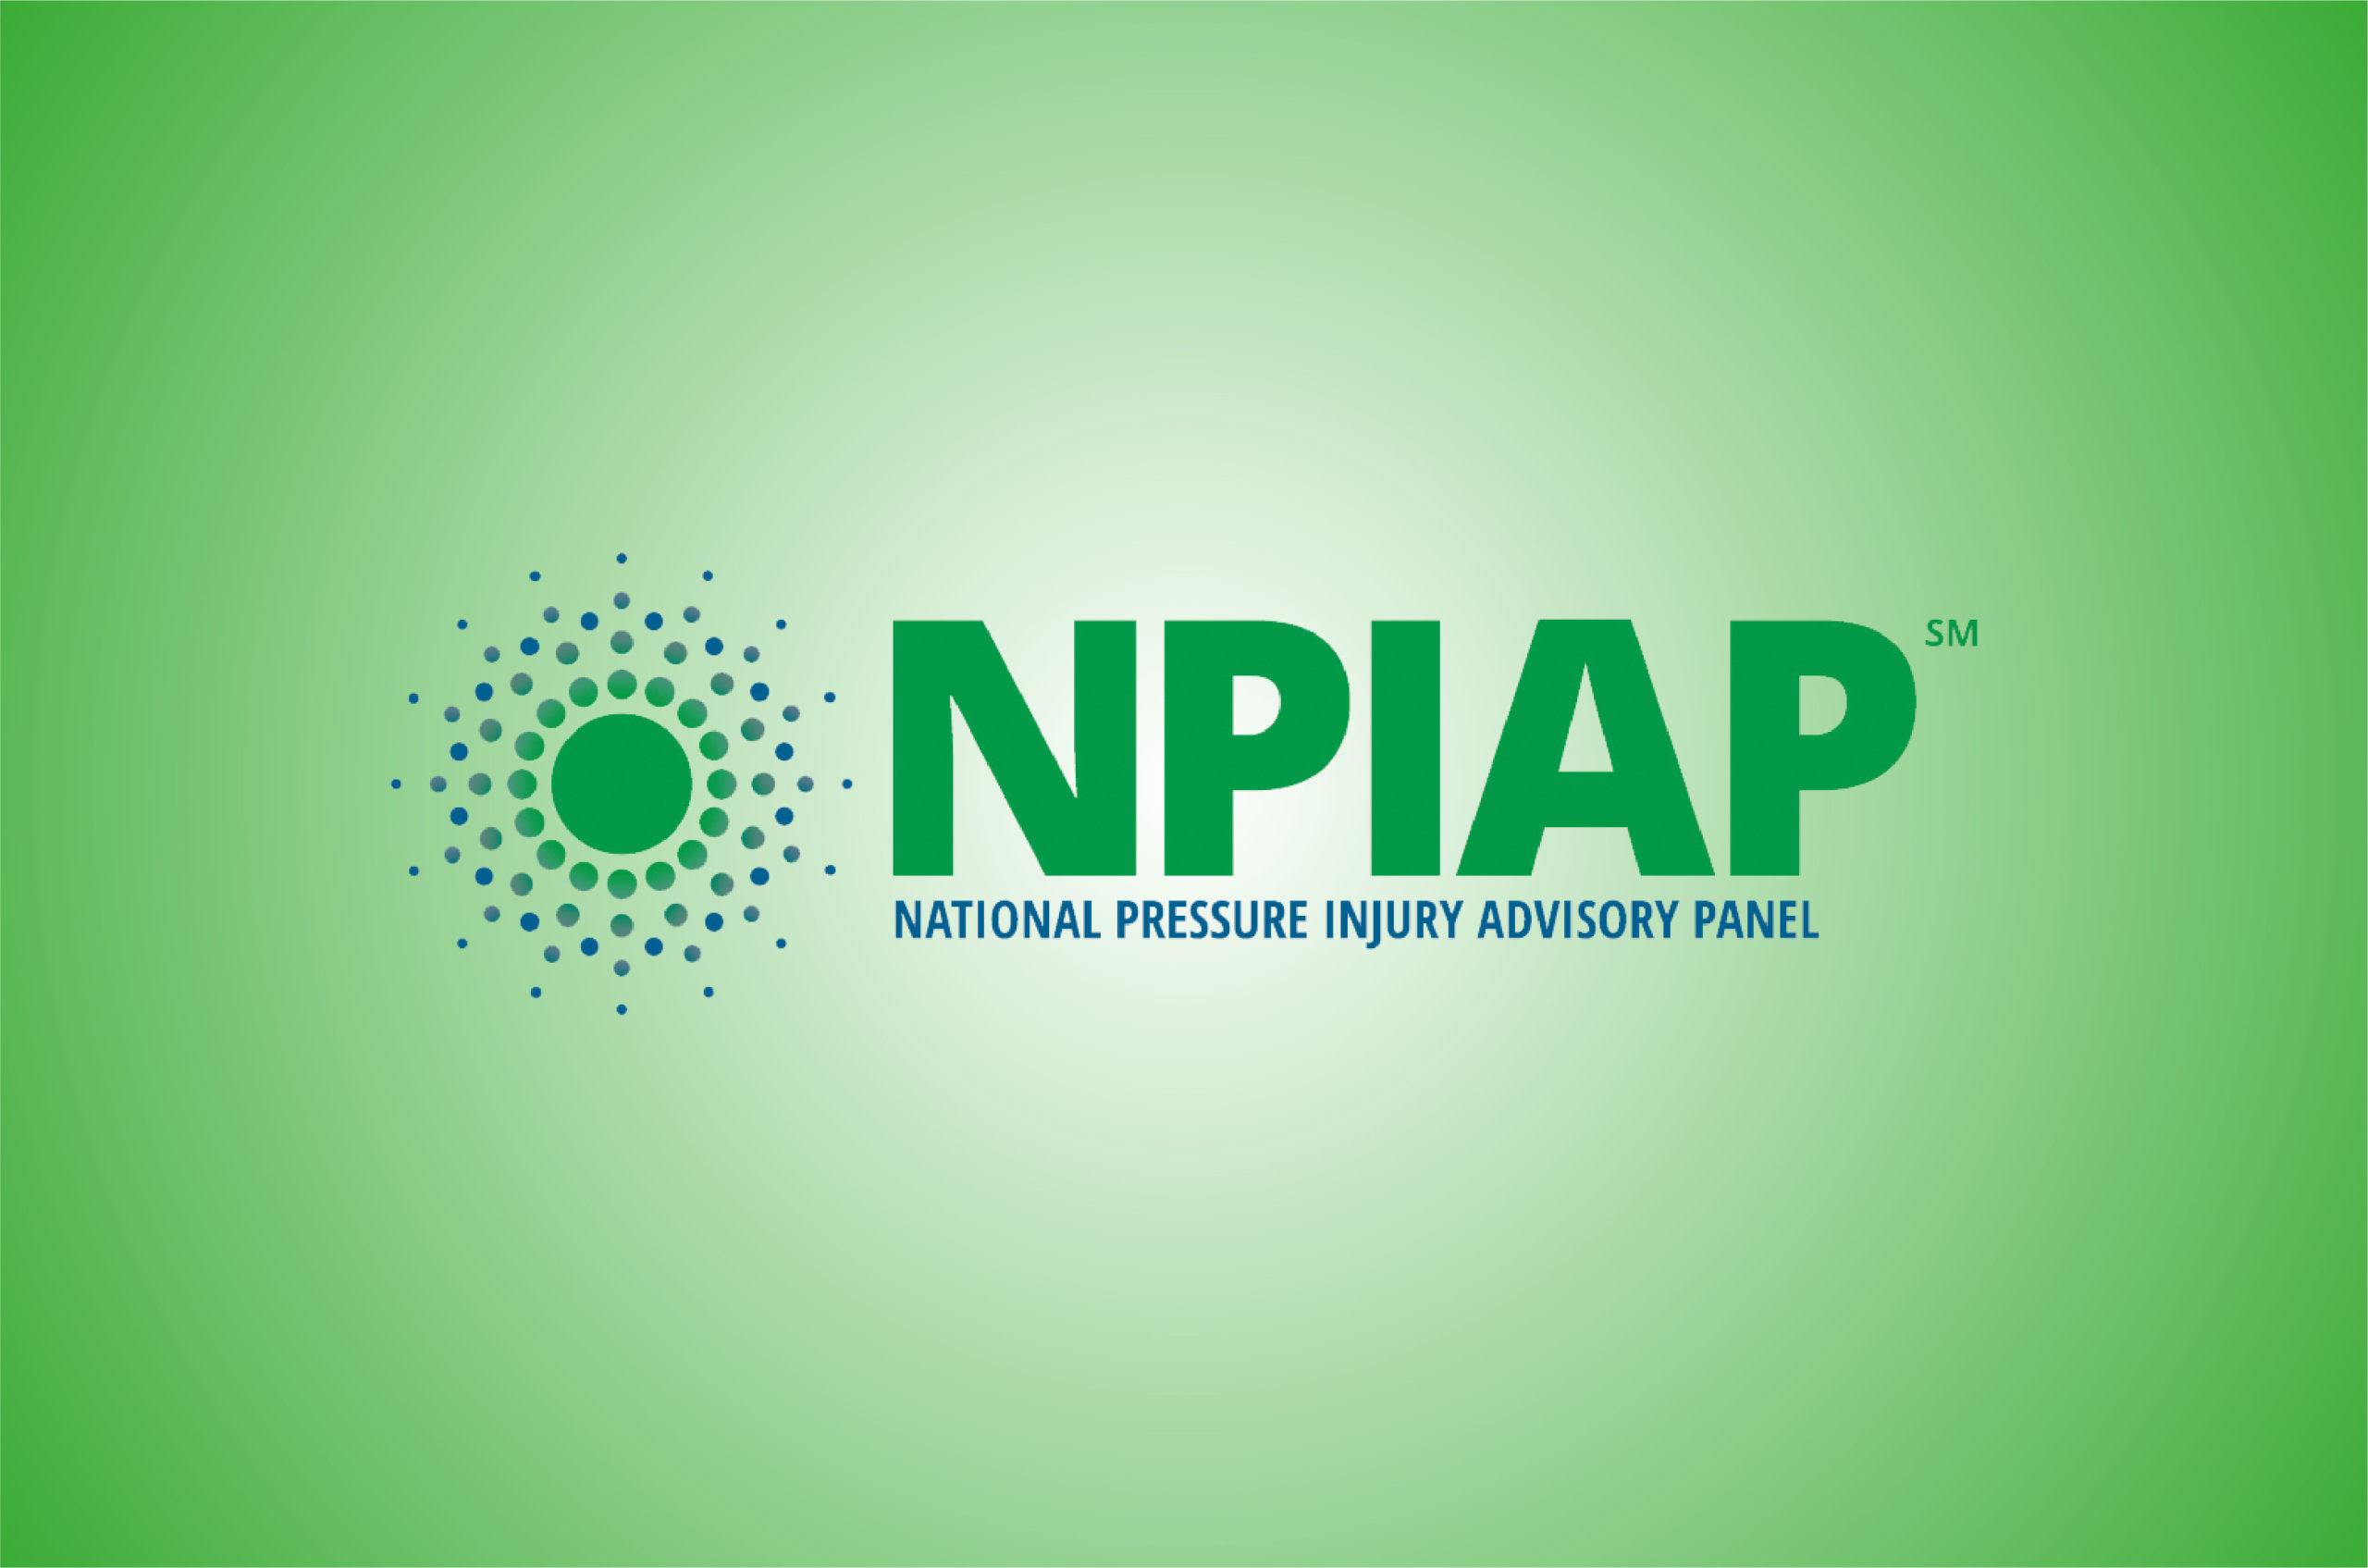 Green Logo for the National Pressure Injury Advisory Panel